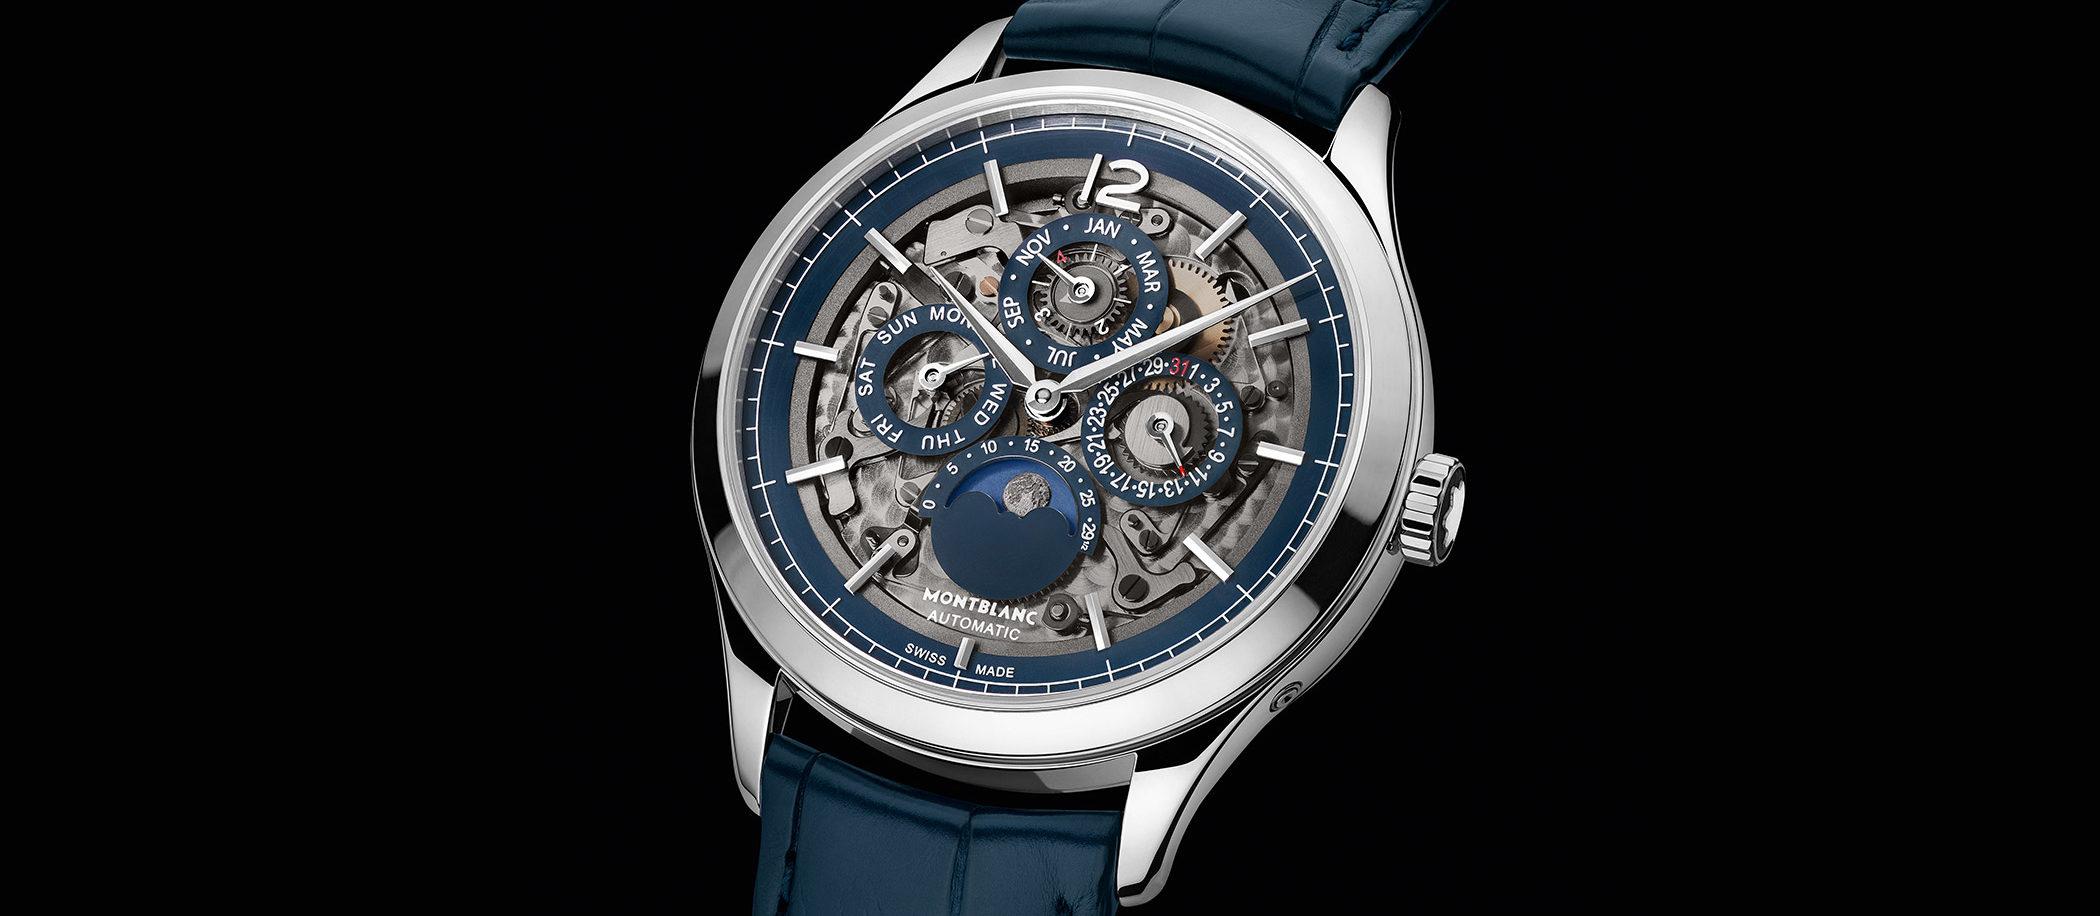 Montblanc Heritage Chronométrie Perpetual Calendar Sapphire